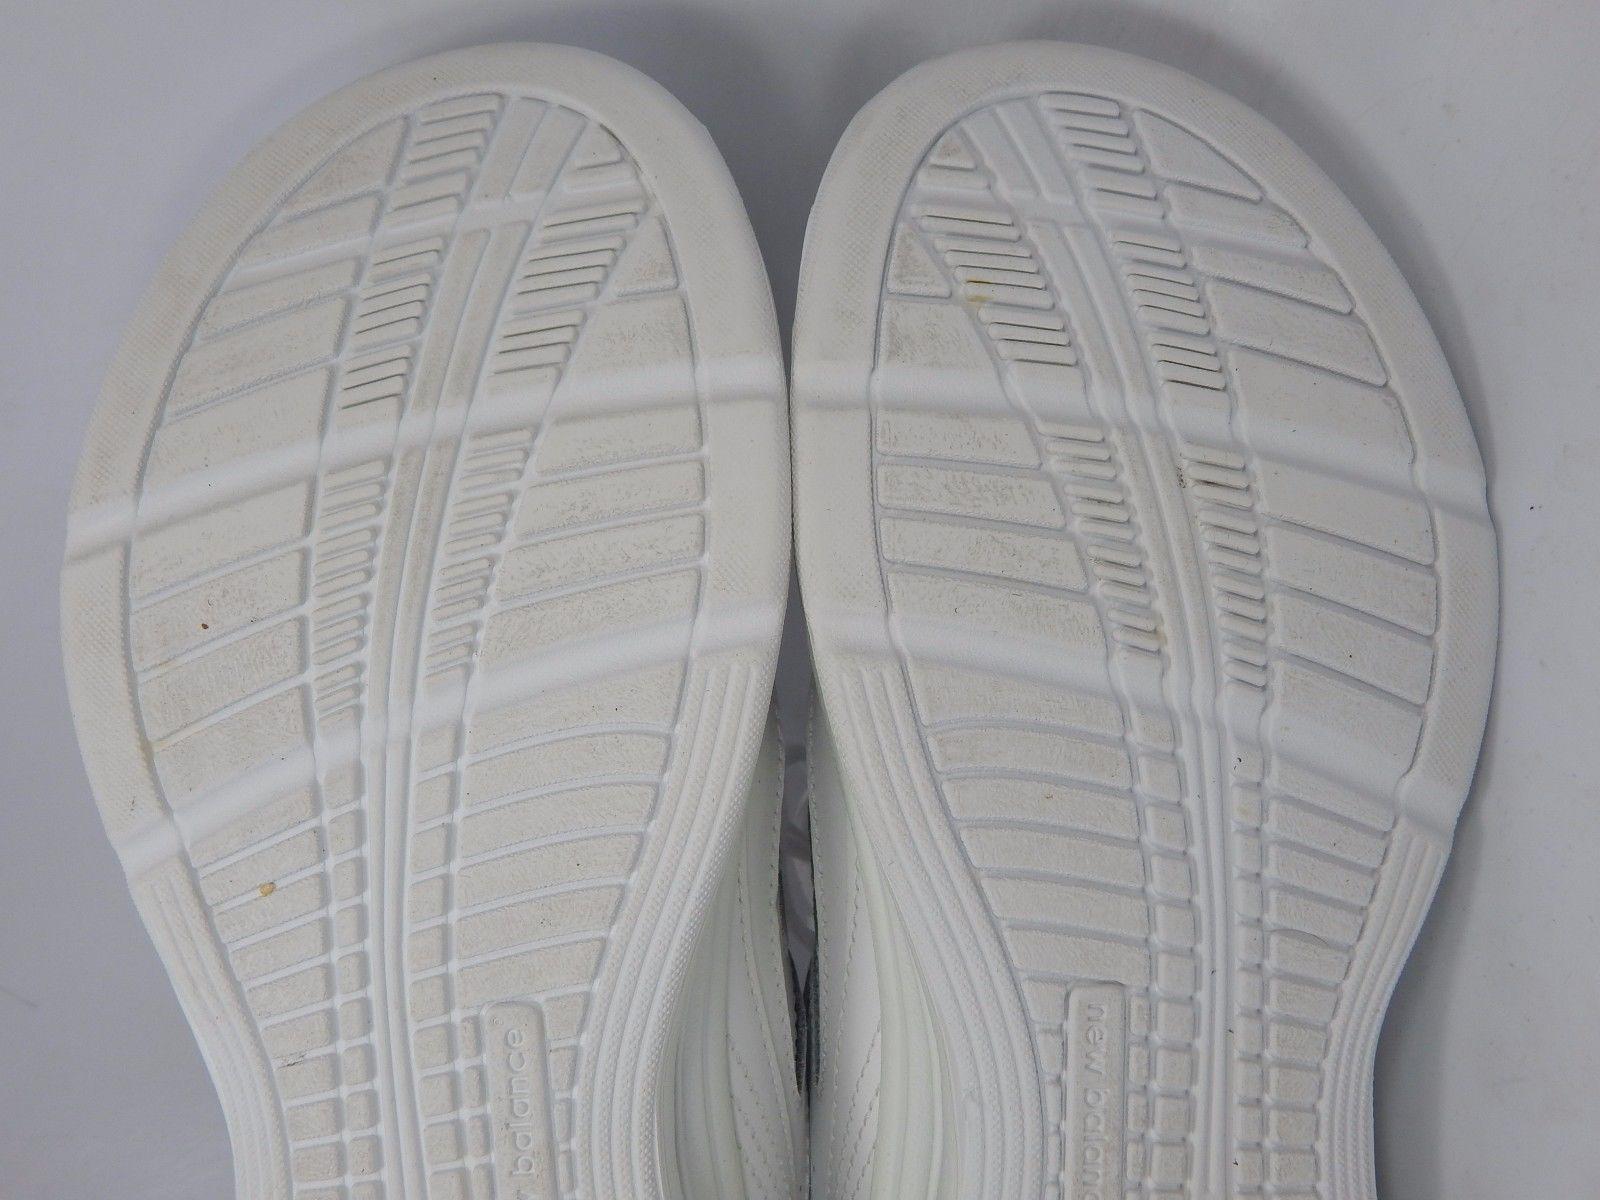 New Balance 577 Women's Walking Shoes Size US 8.5 M (B) EU 40 White WW577WT